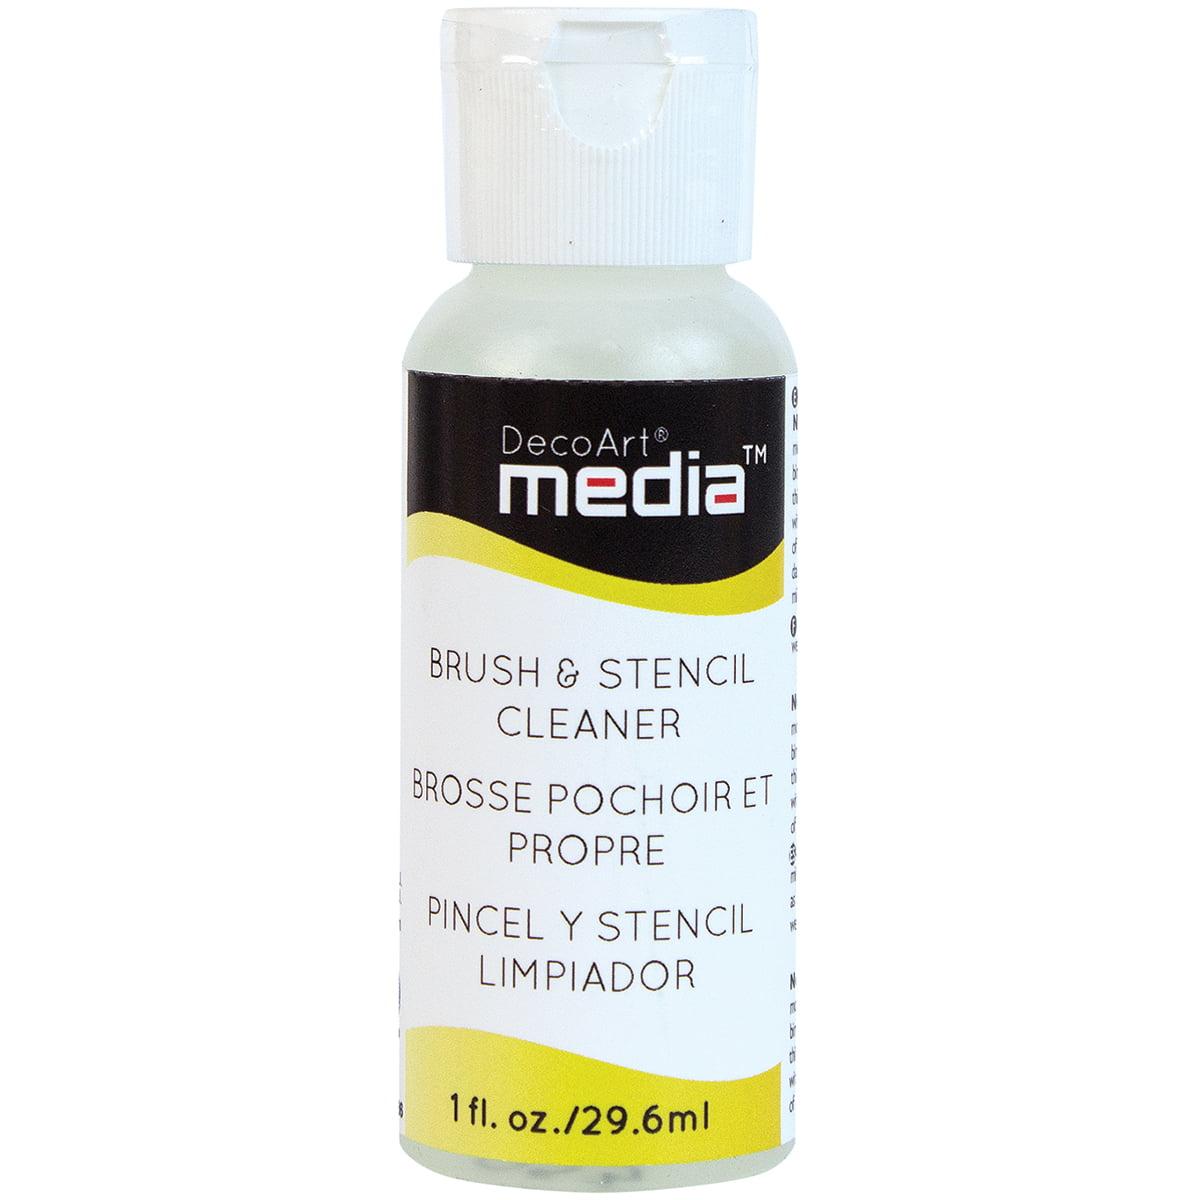 Brush & Stencil Cleaner 2Oz- - image 1 de 1